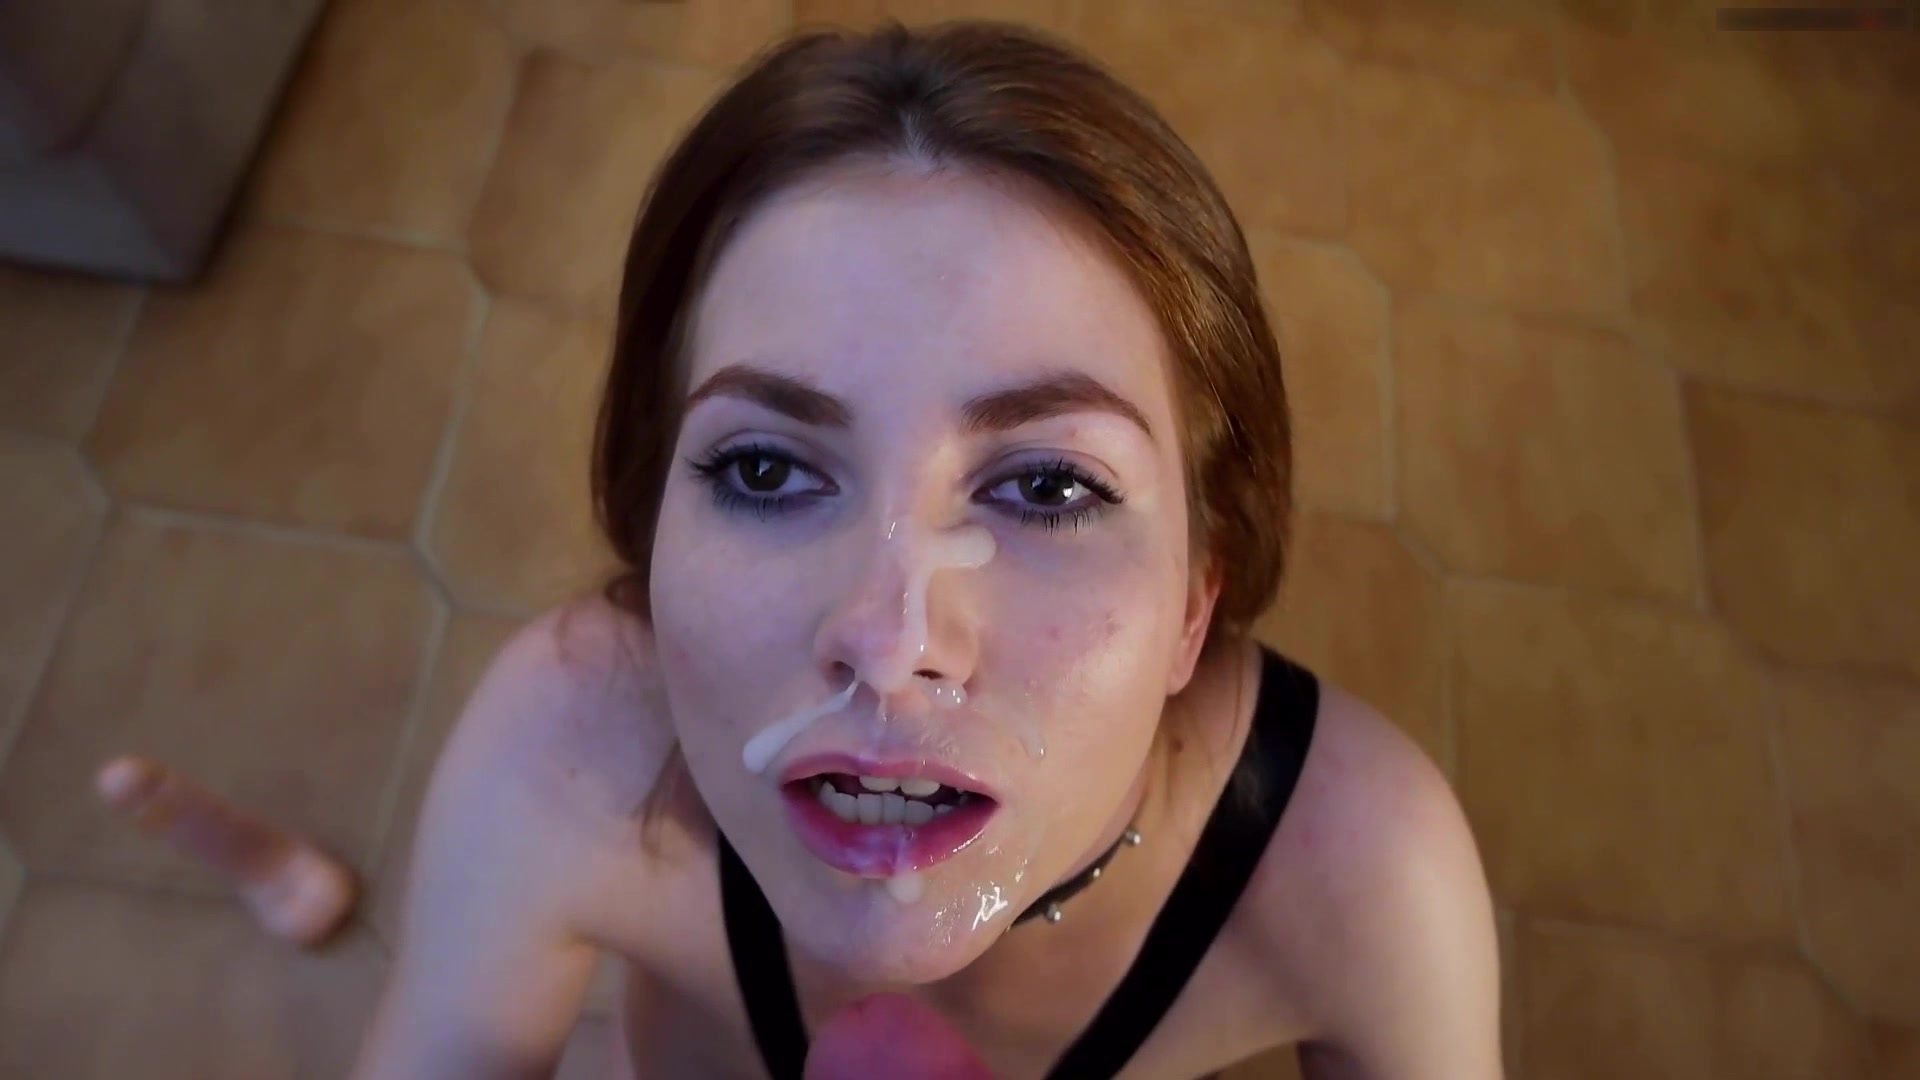 ladysweet_x - boy girl blowjob - premium hd - camvideos.tv